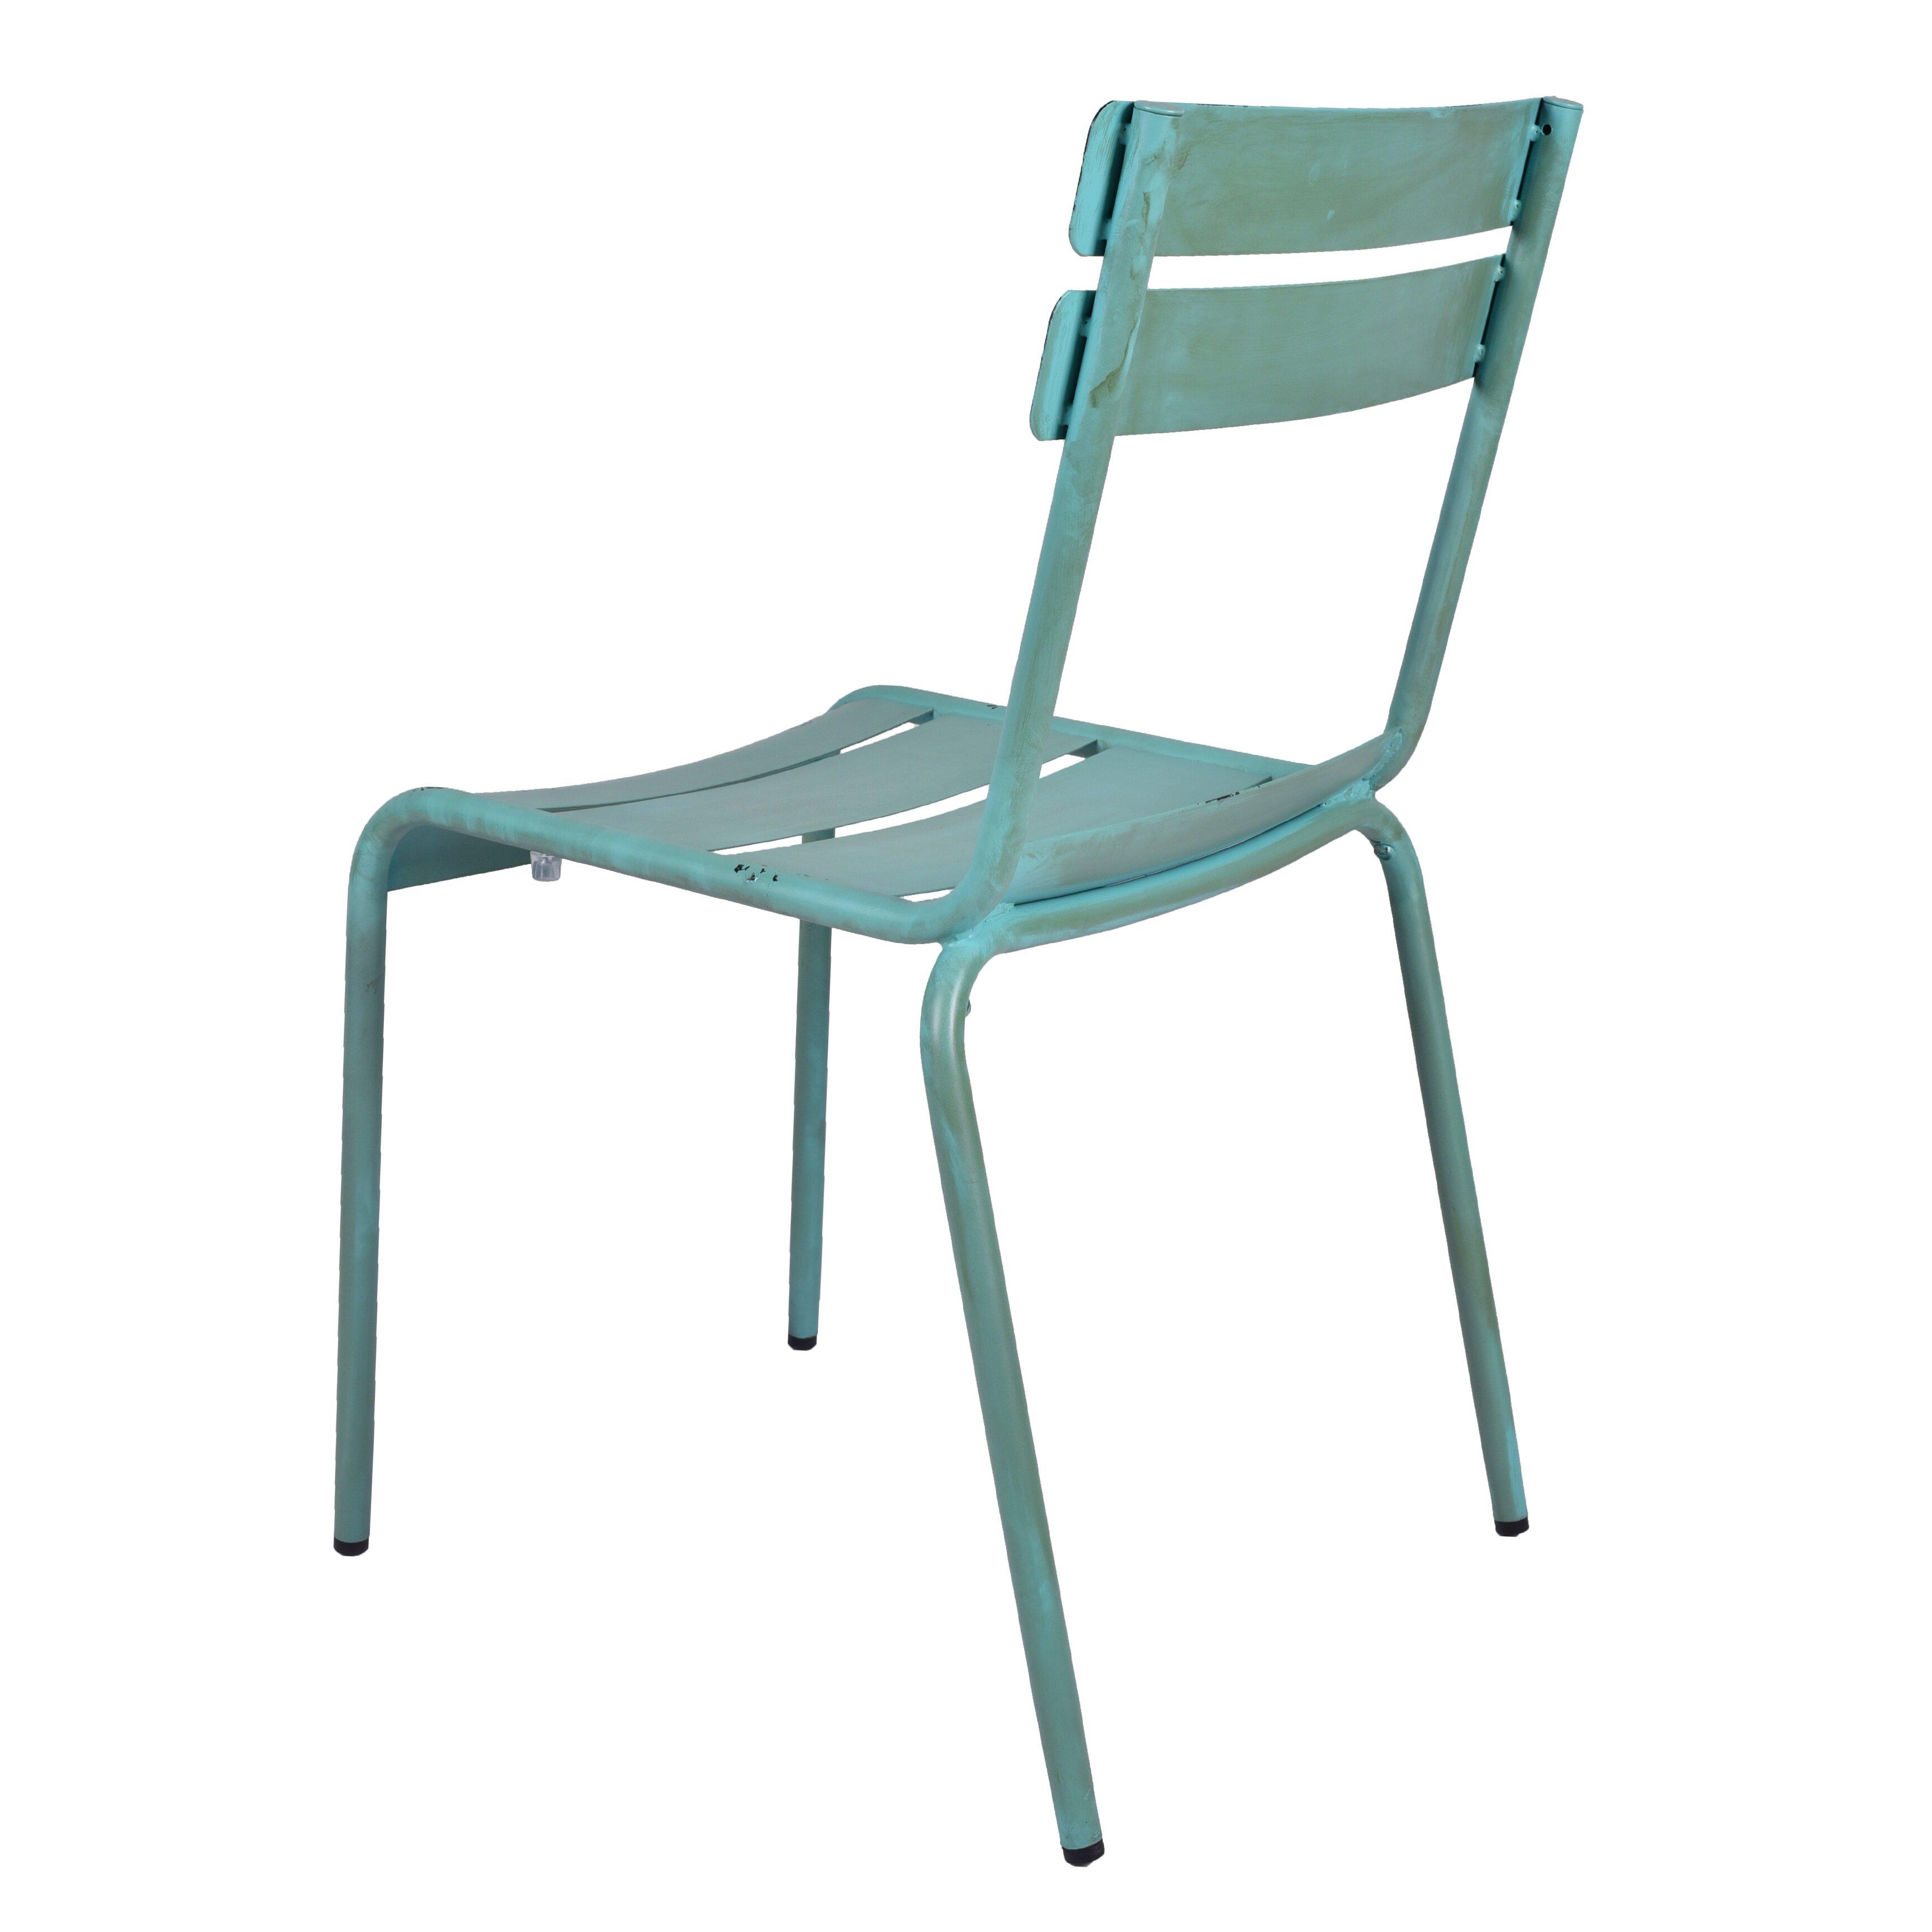 Porthos home gordon side chair reviews wayfair - Table ovale scandinave ...